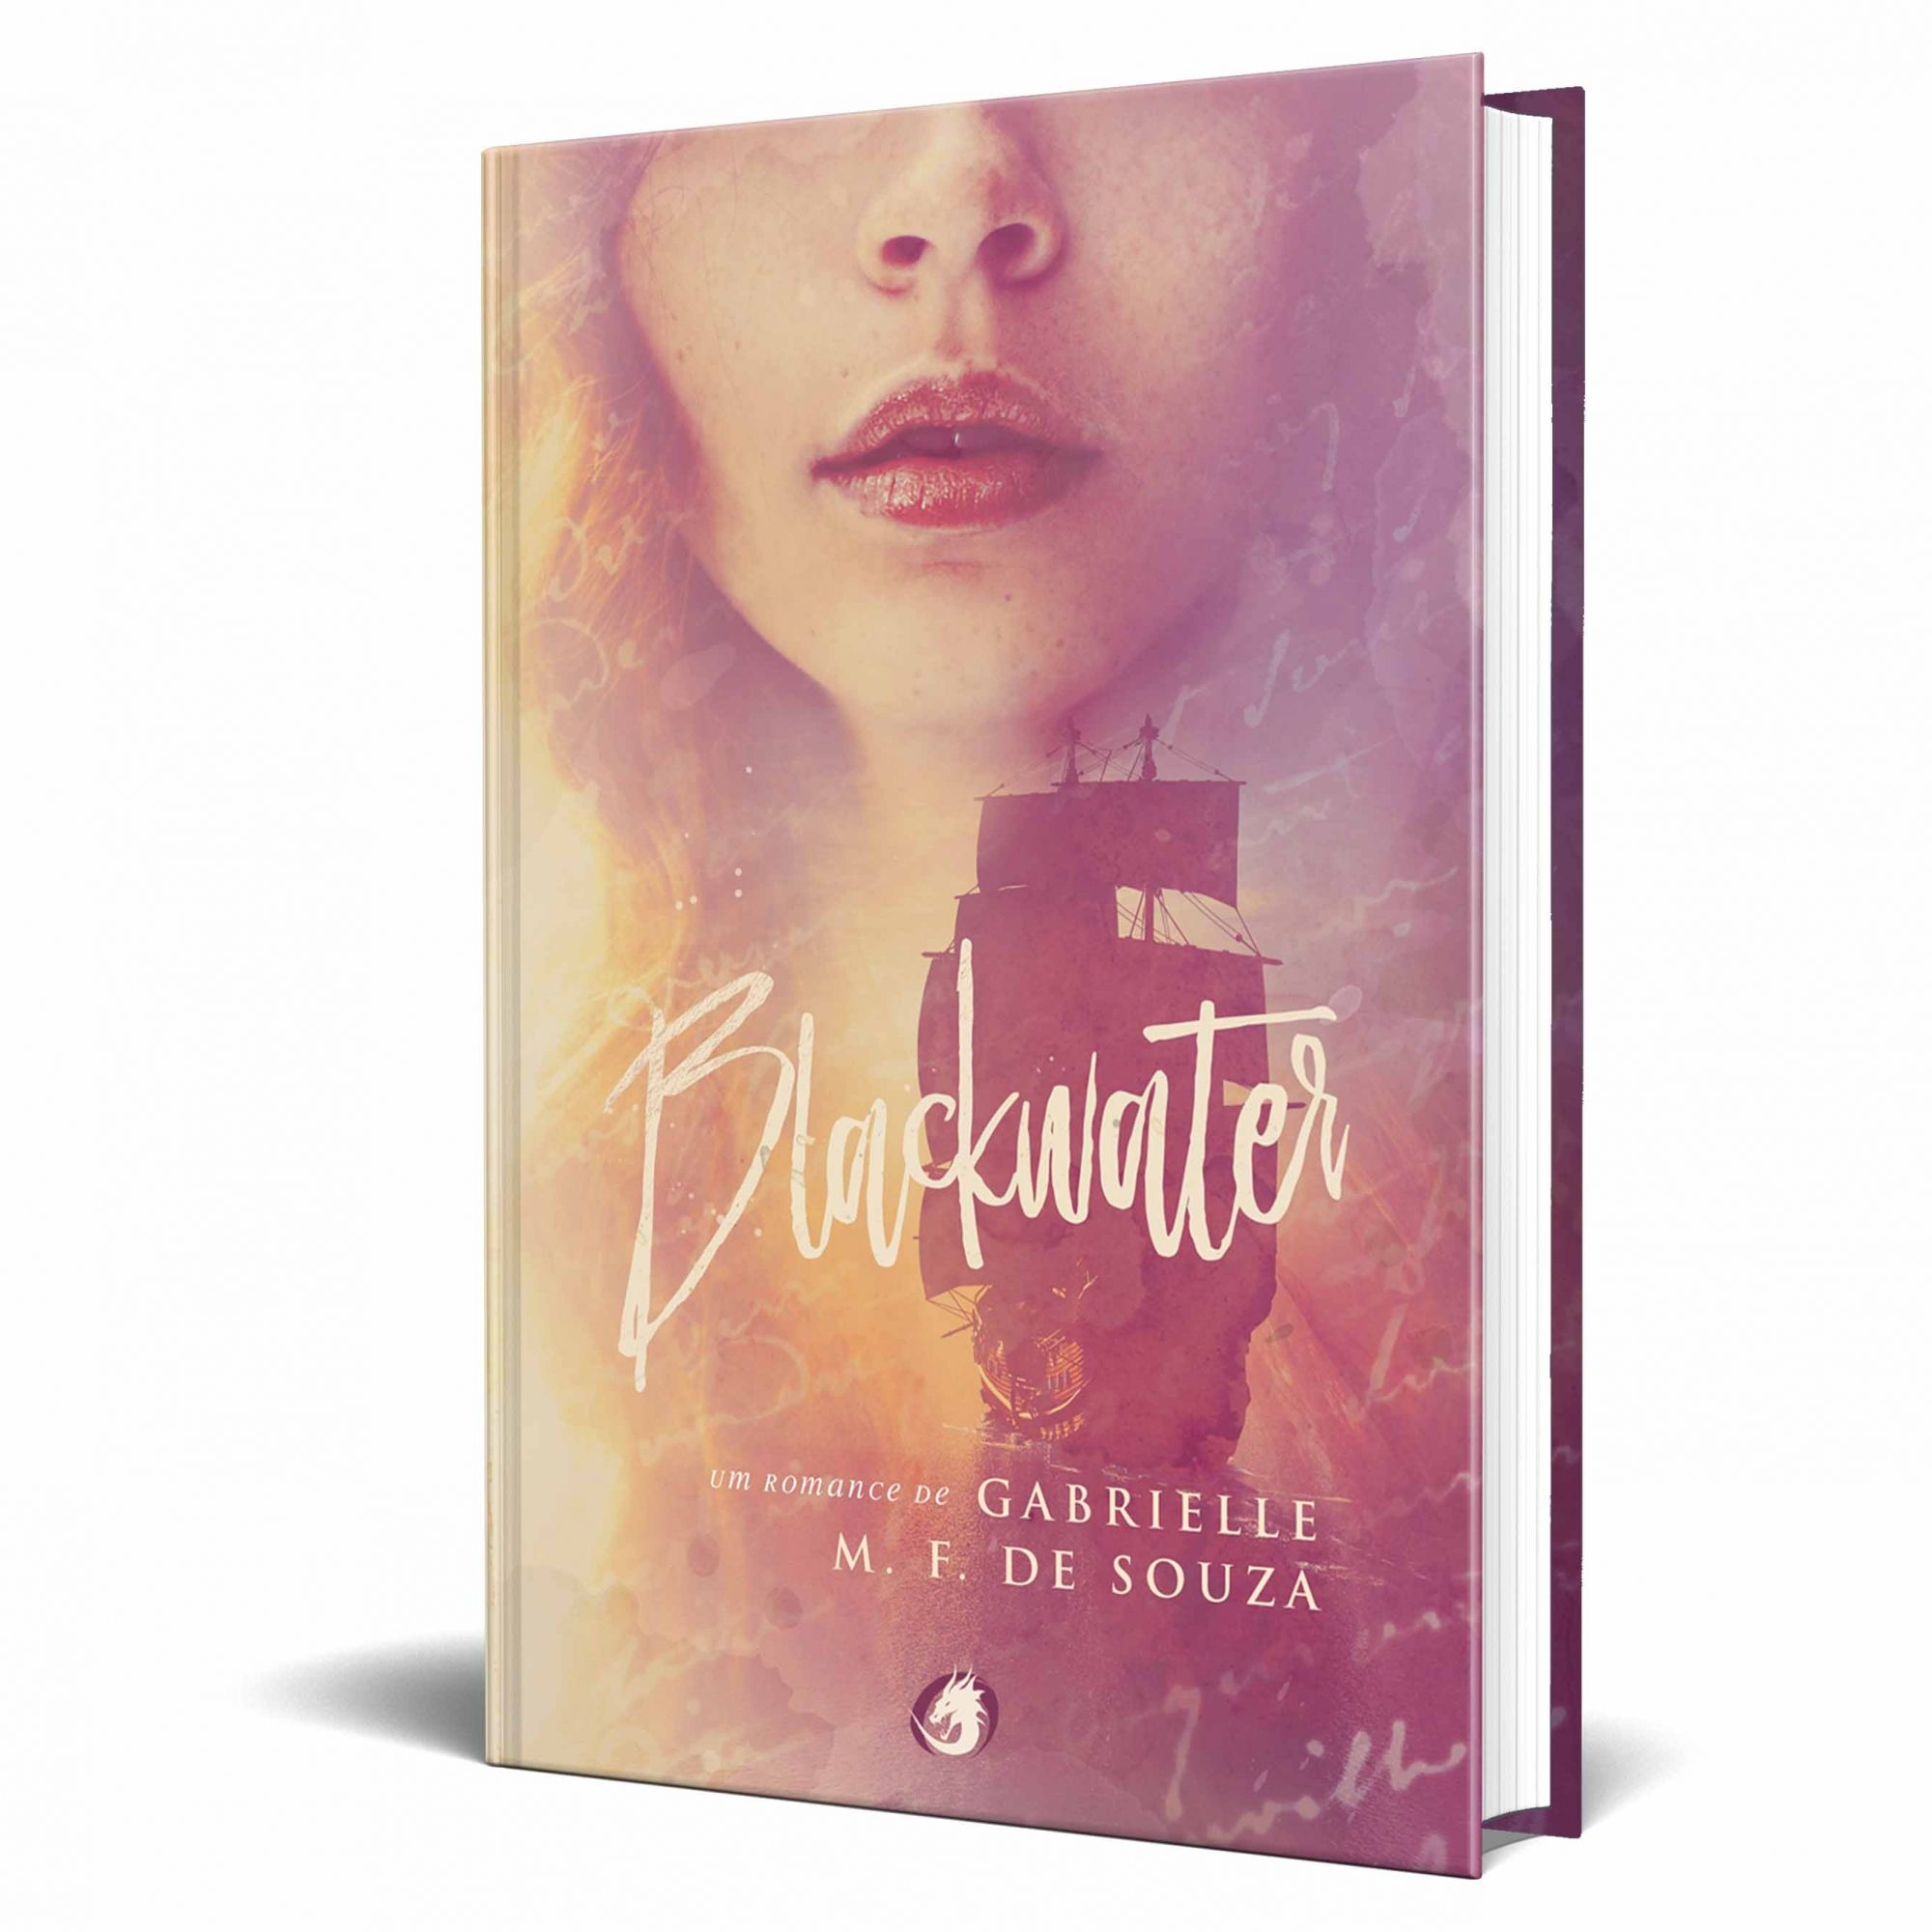 Livro Blackwater